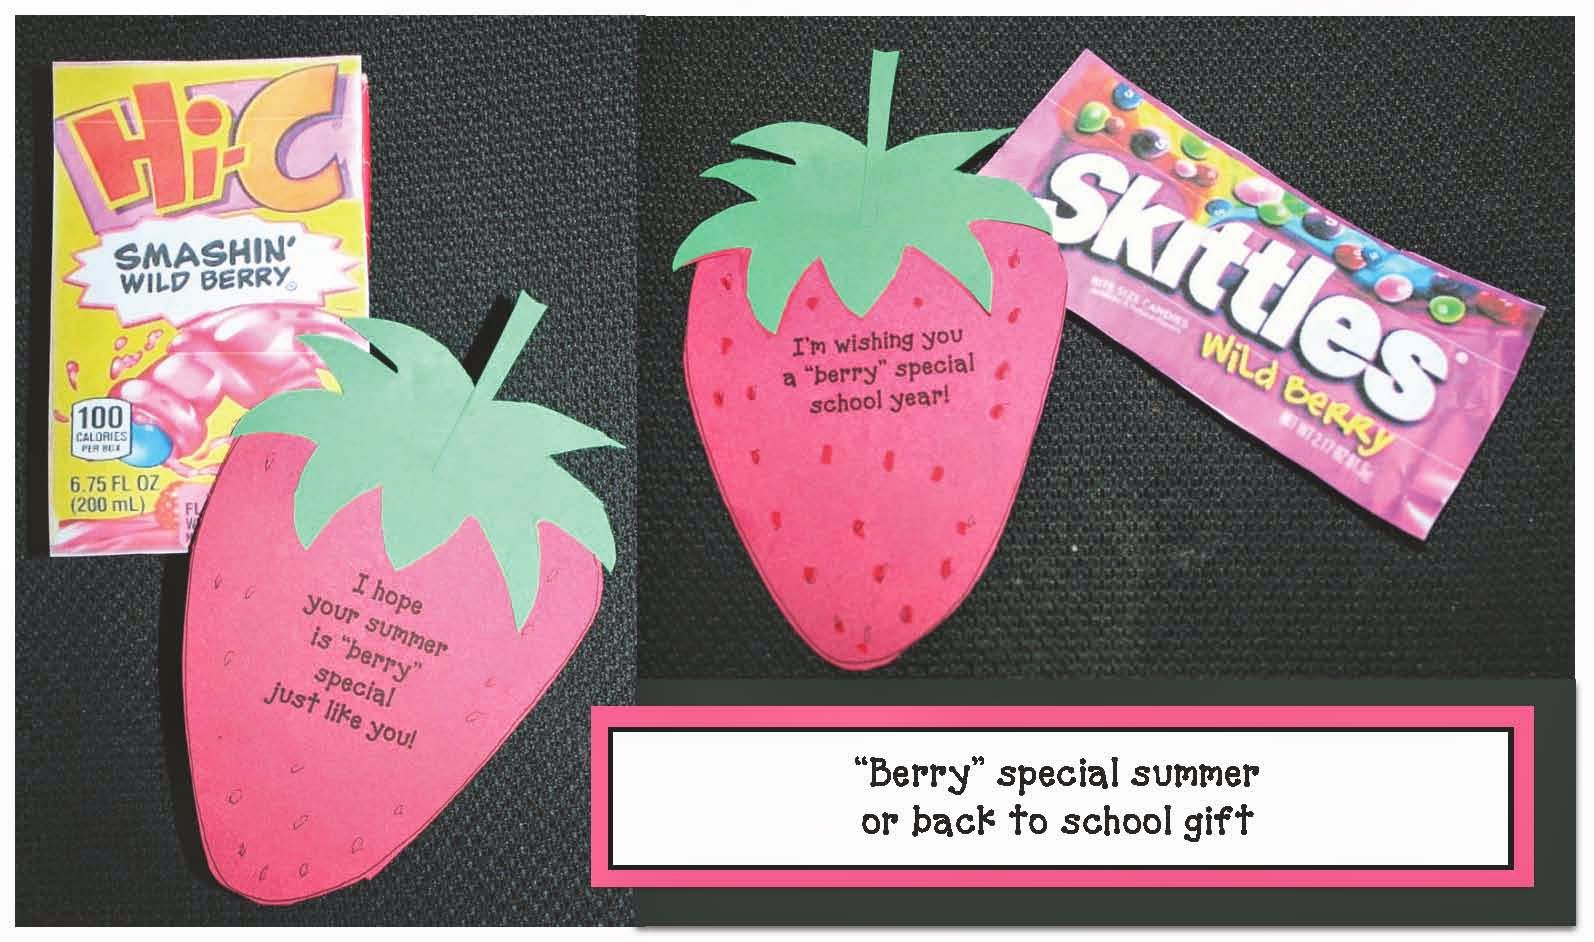 http://4.bp.blogspot.com/-eNGXK3loJFM/VT9mmnjRmLI/AAAAAAAAOHQ/4qmByxBFJH4/s1600/berry%2Bspecial%2Bcov.jpg